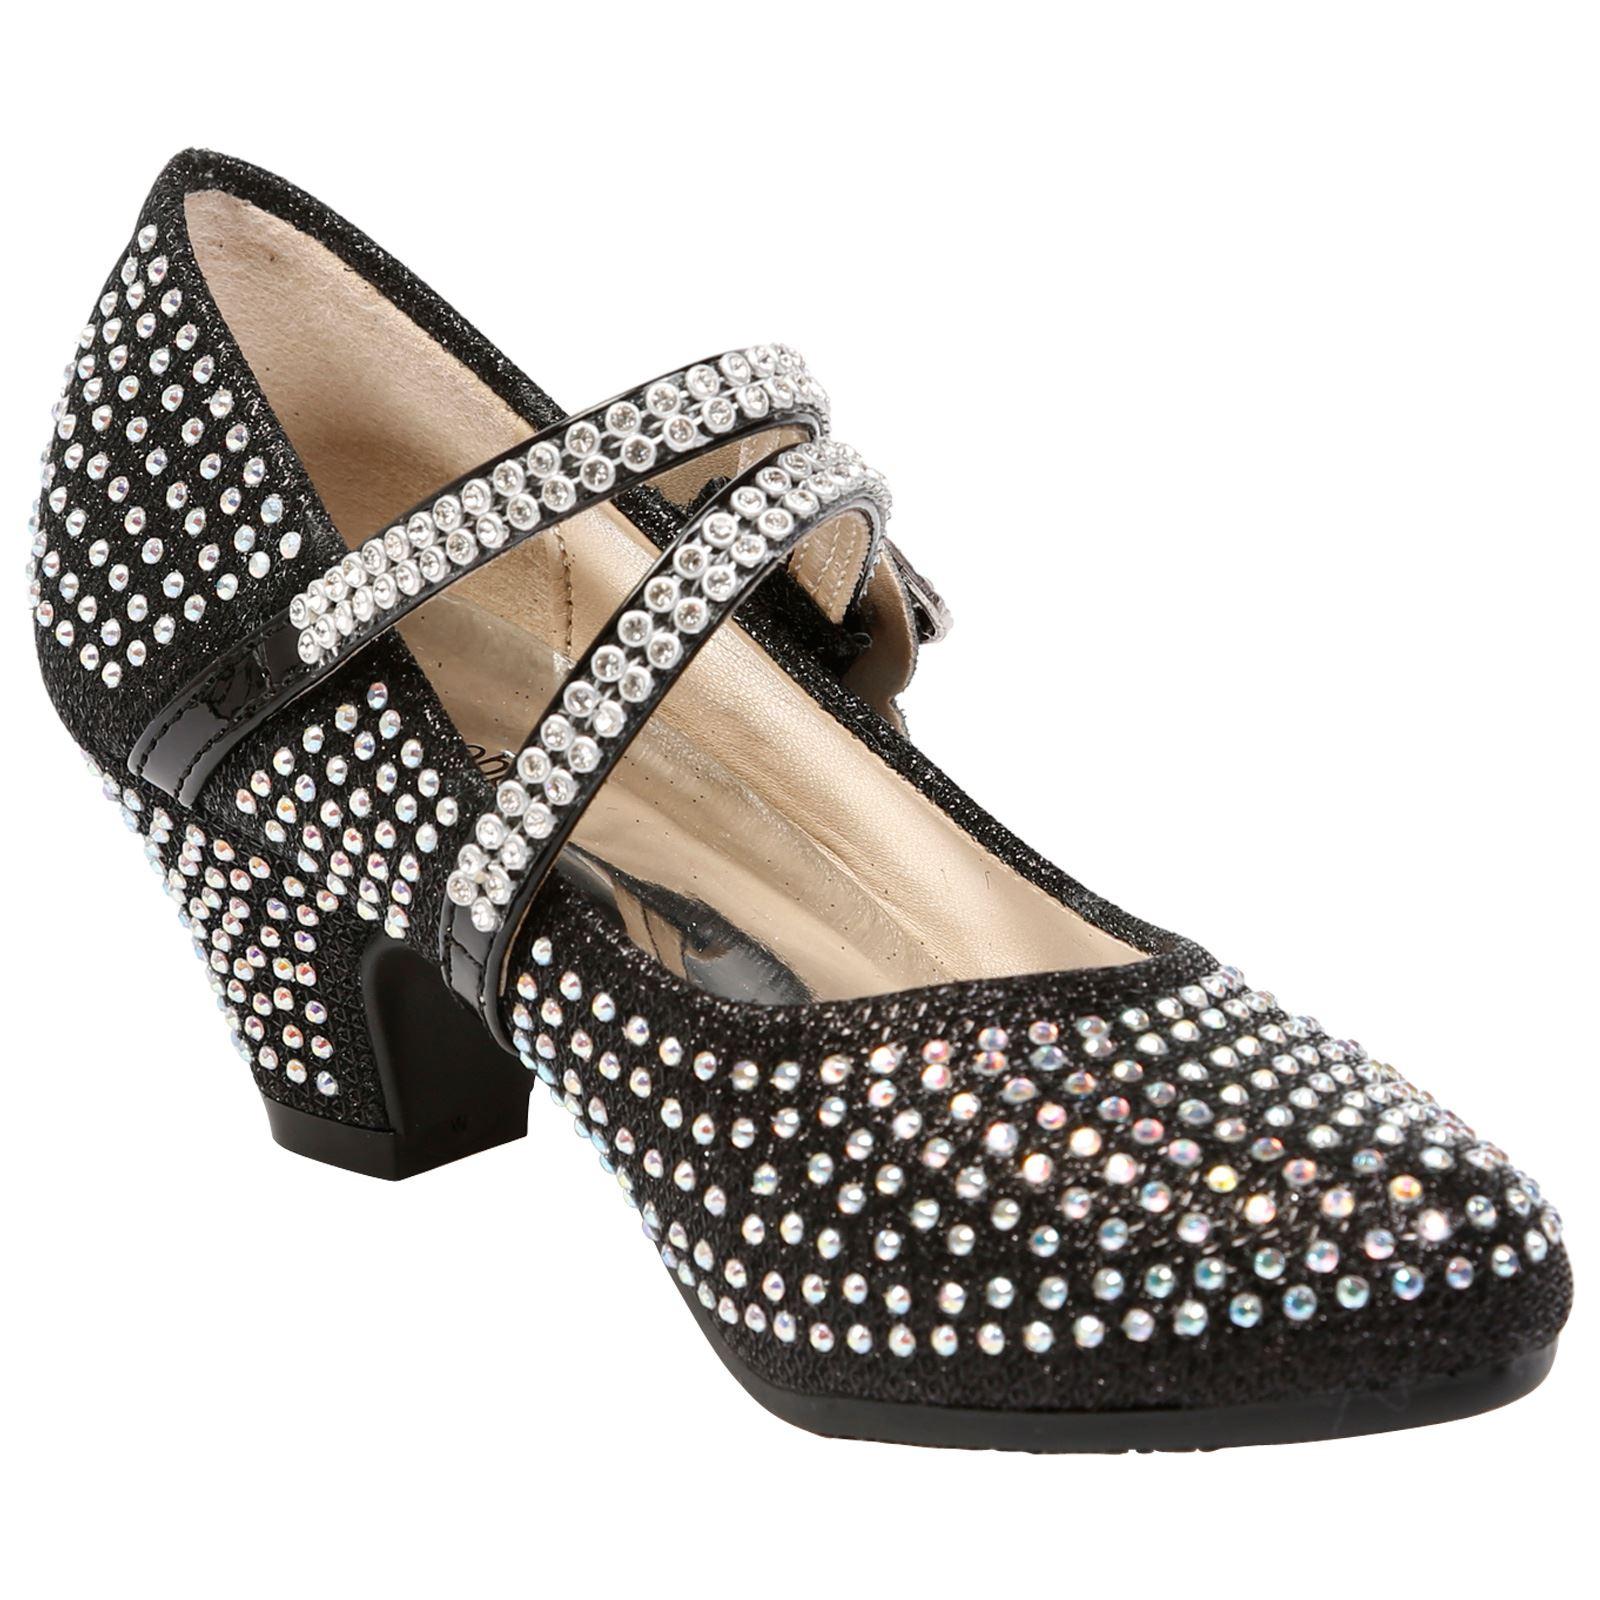 Niñas Niños Childrens Tacón Bajo Fiesta Boda Diamante Estilo Mary Jane Zapatos Talla